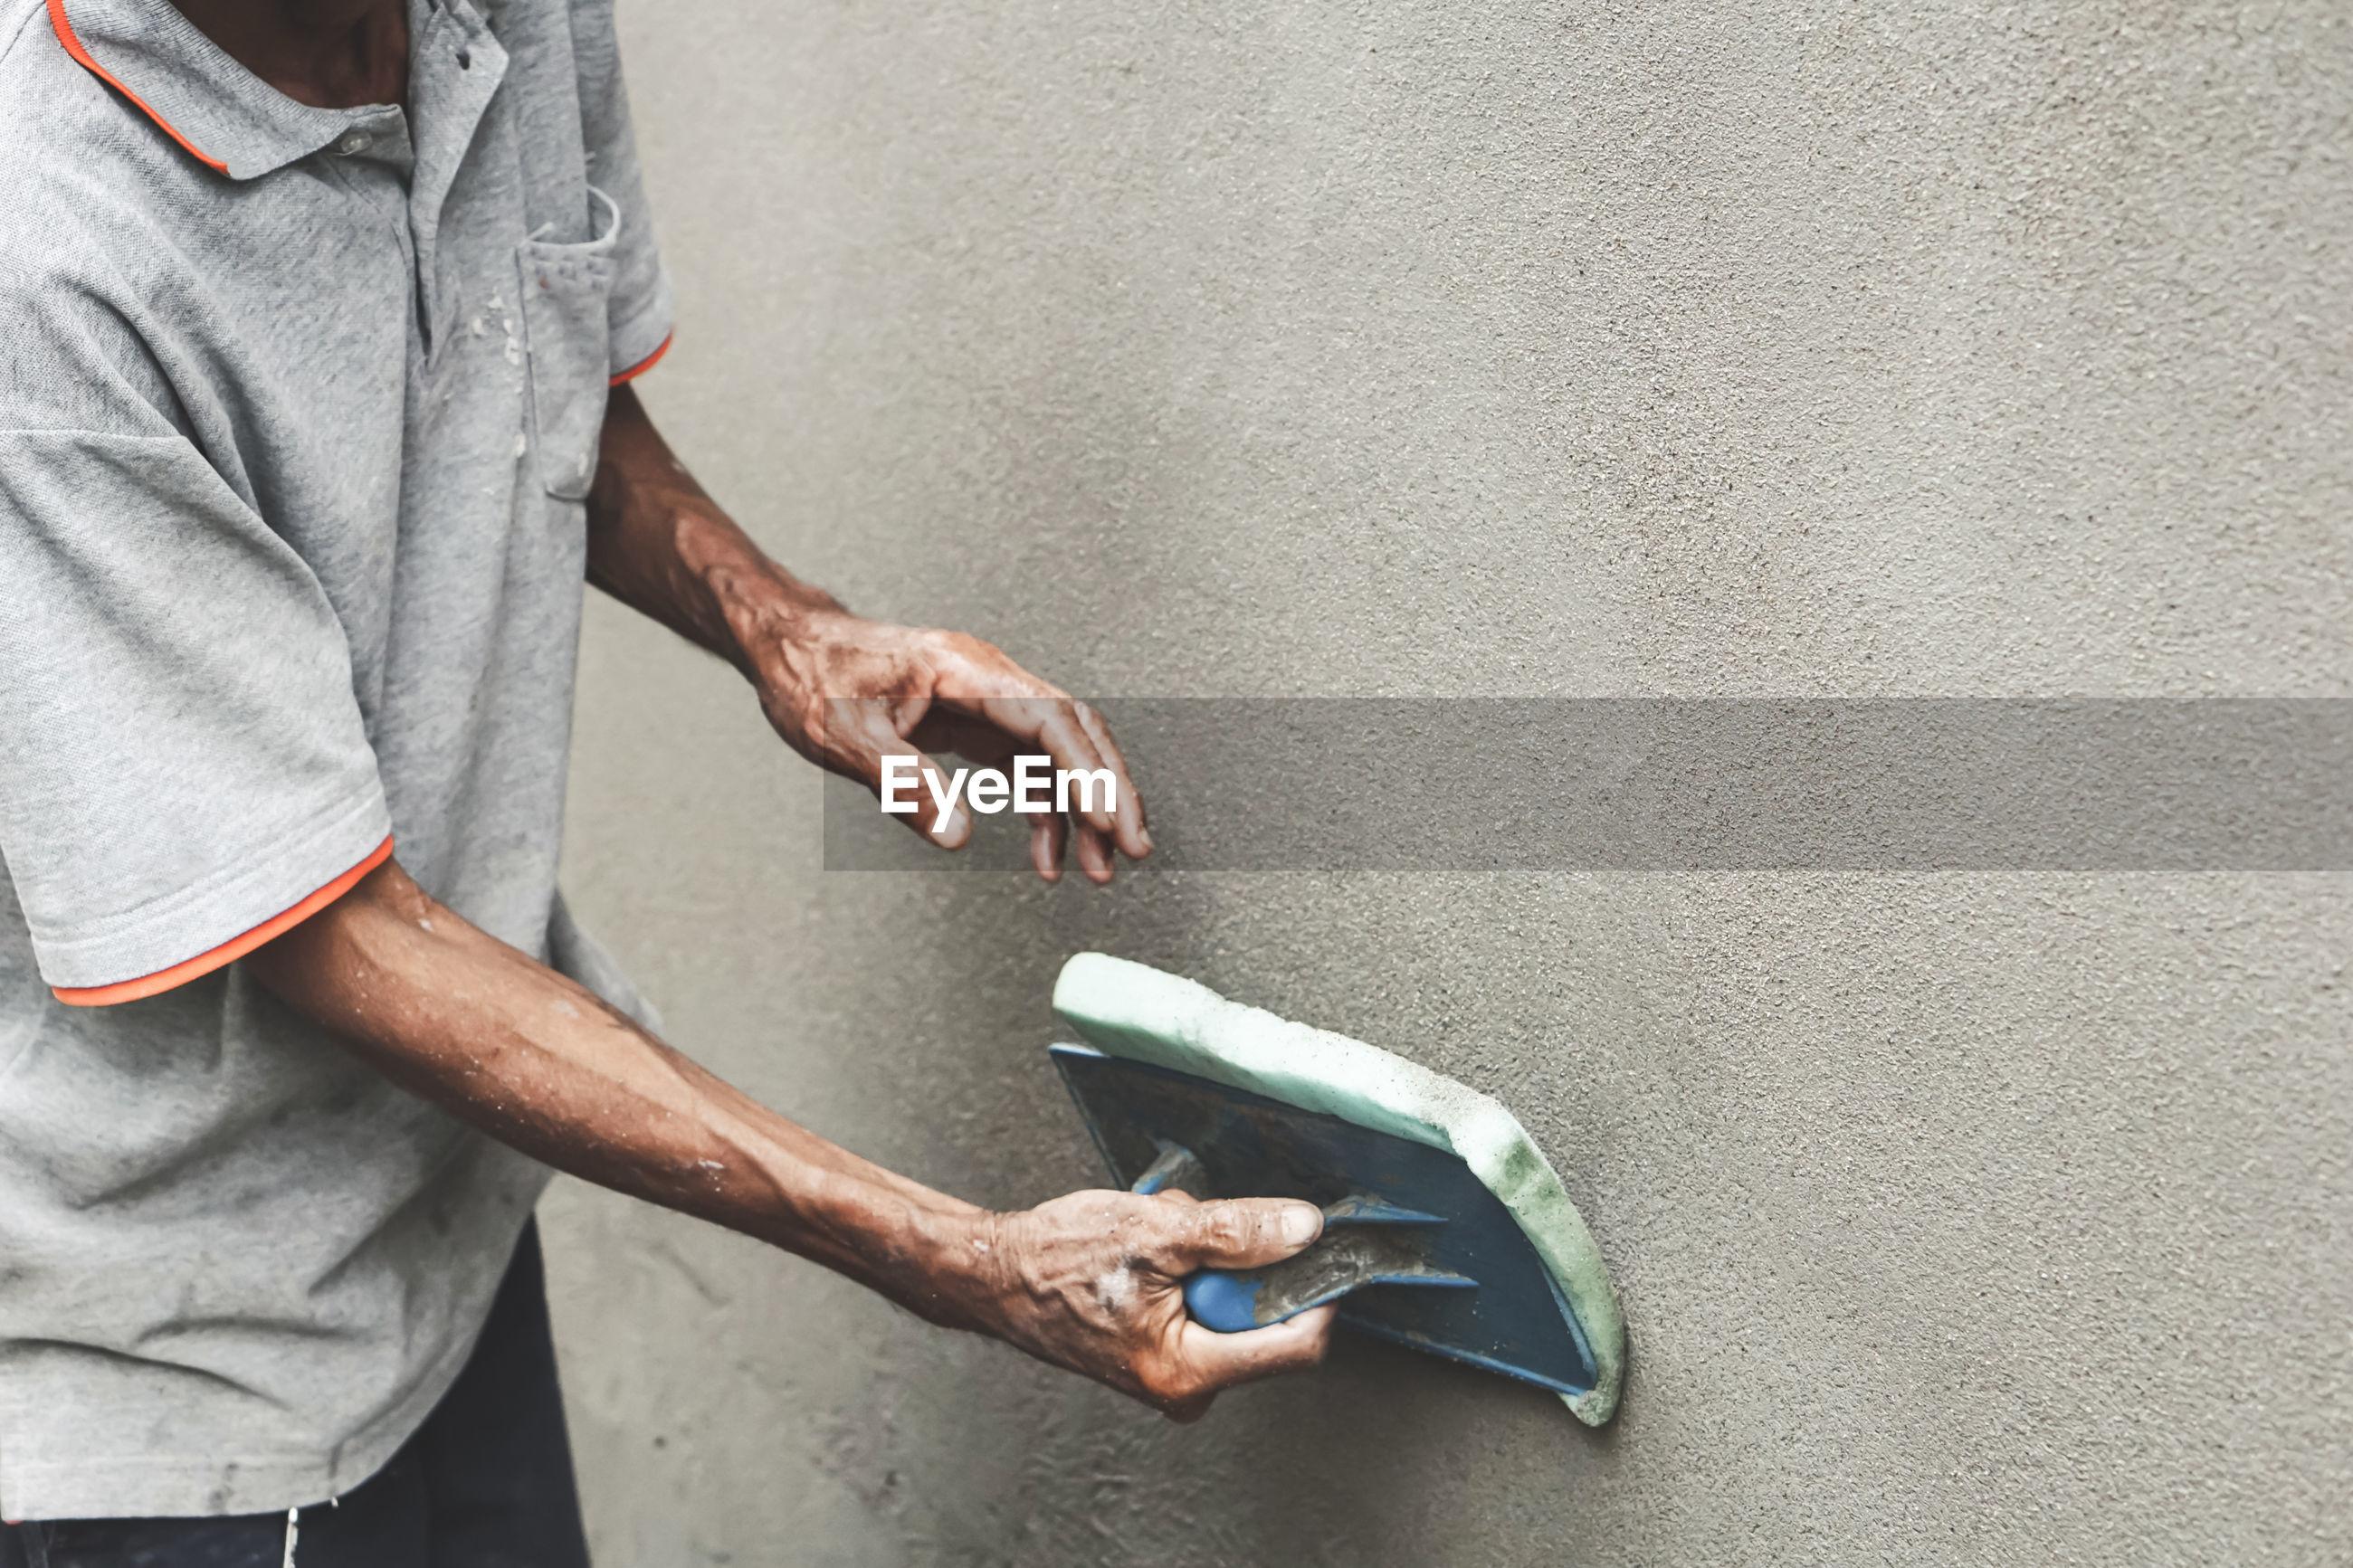 Asian male worker plasterer using a plastering sponge float on an outdoor cement wall